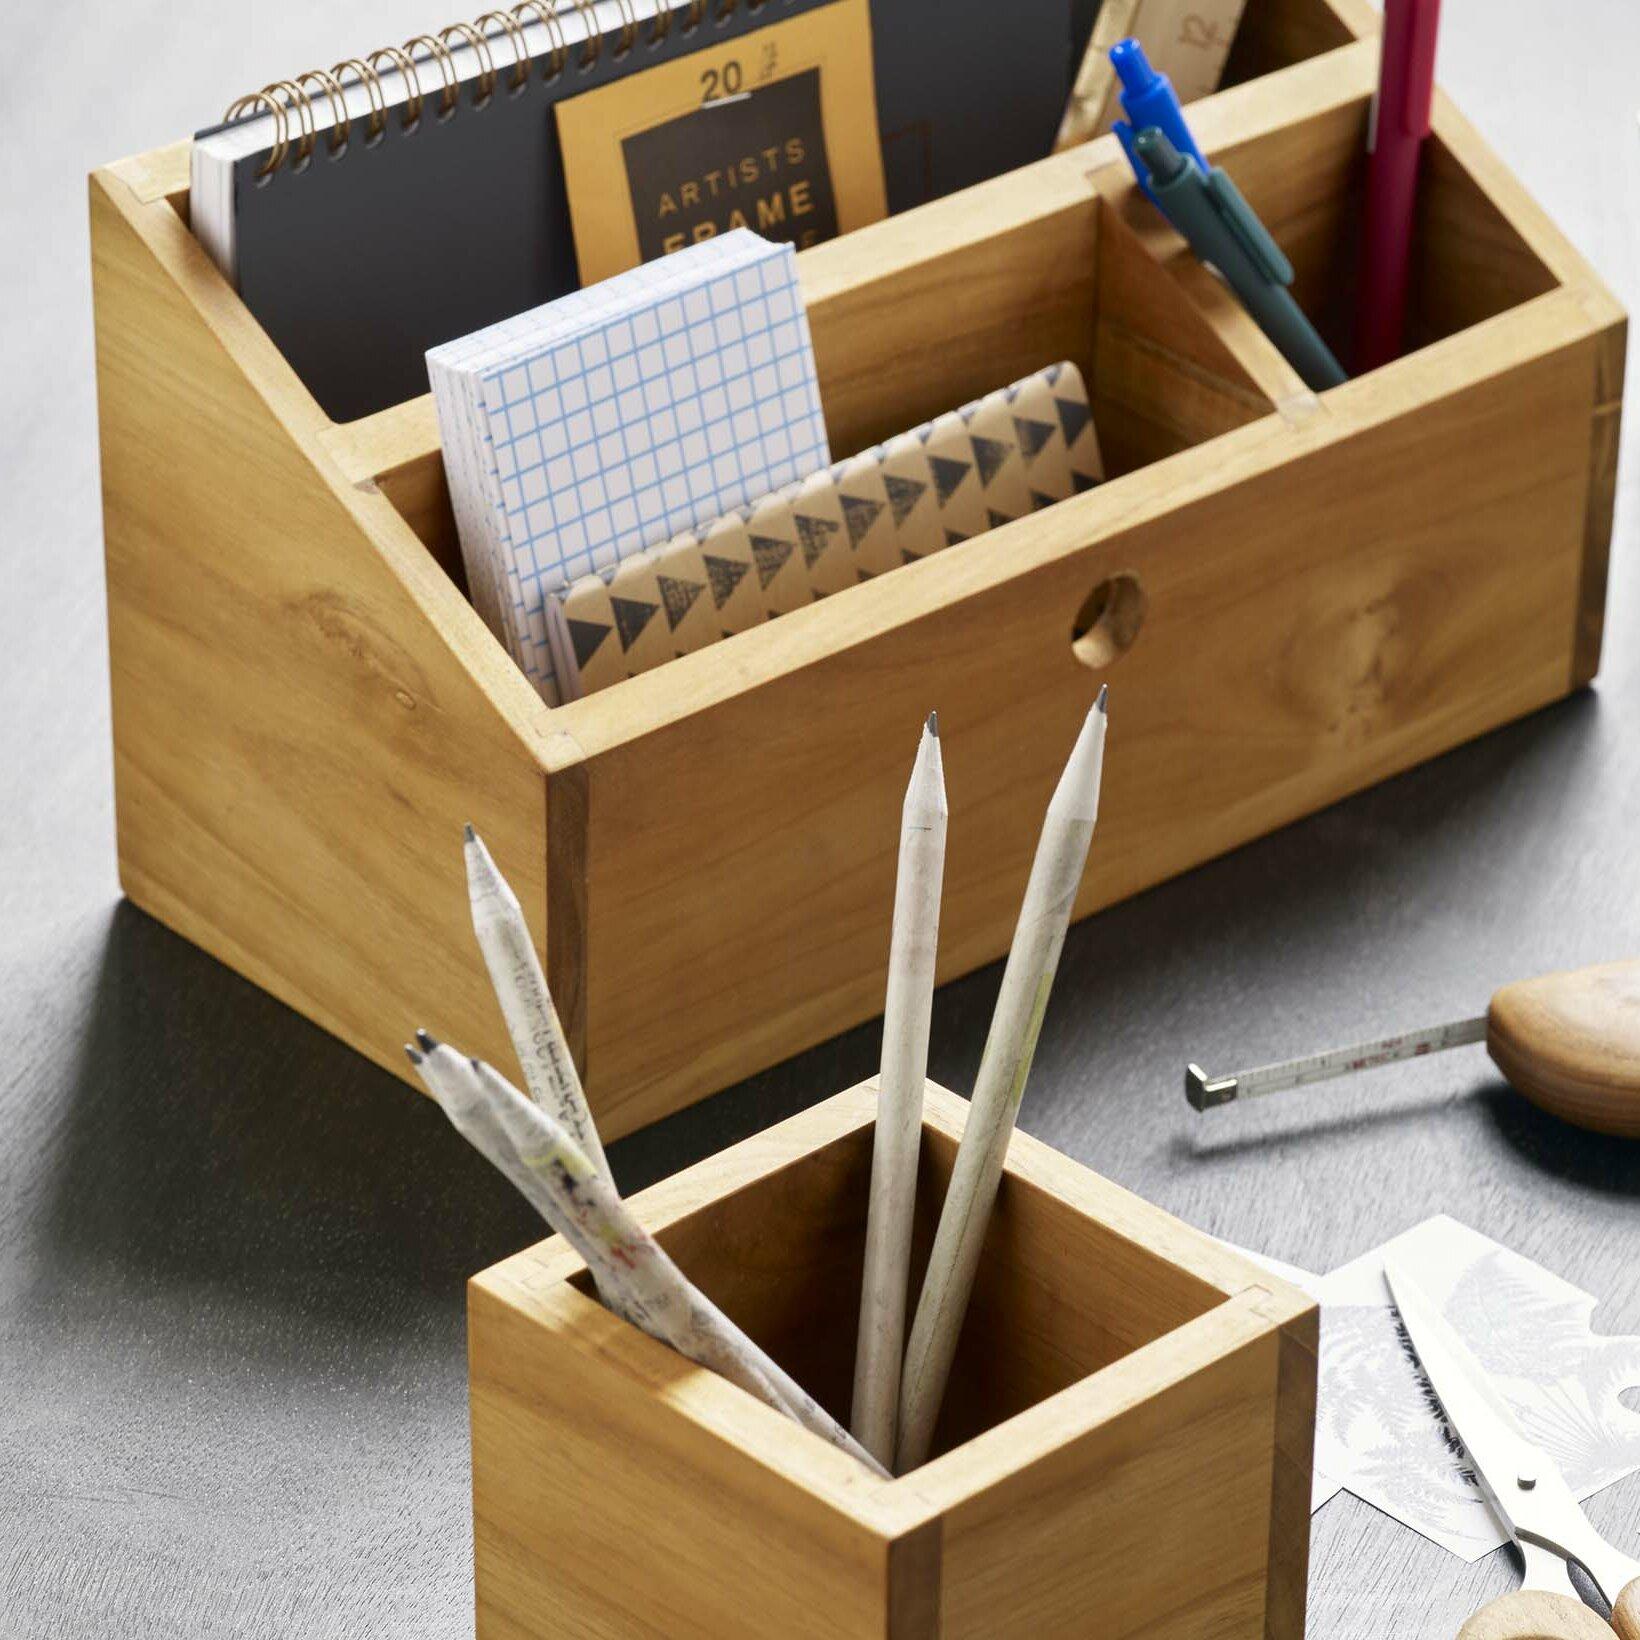 Union Rustic Loredana Supplier Desk Organizer Reviews Wayfair